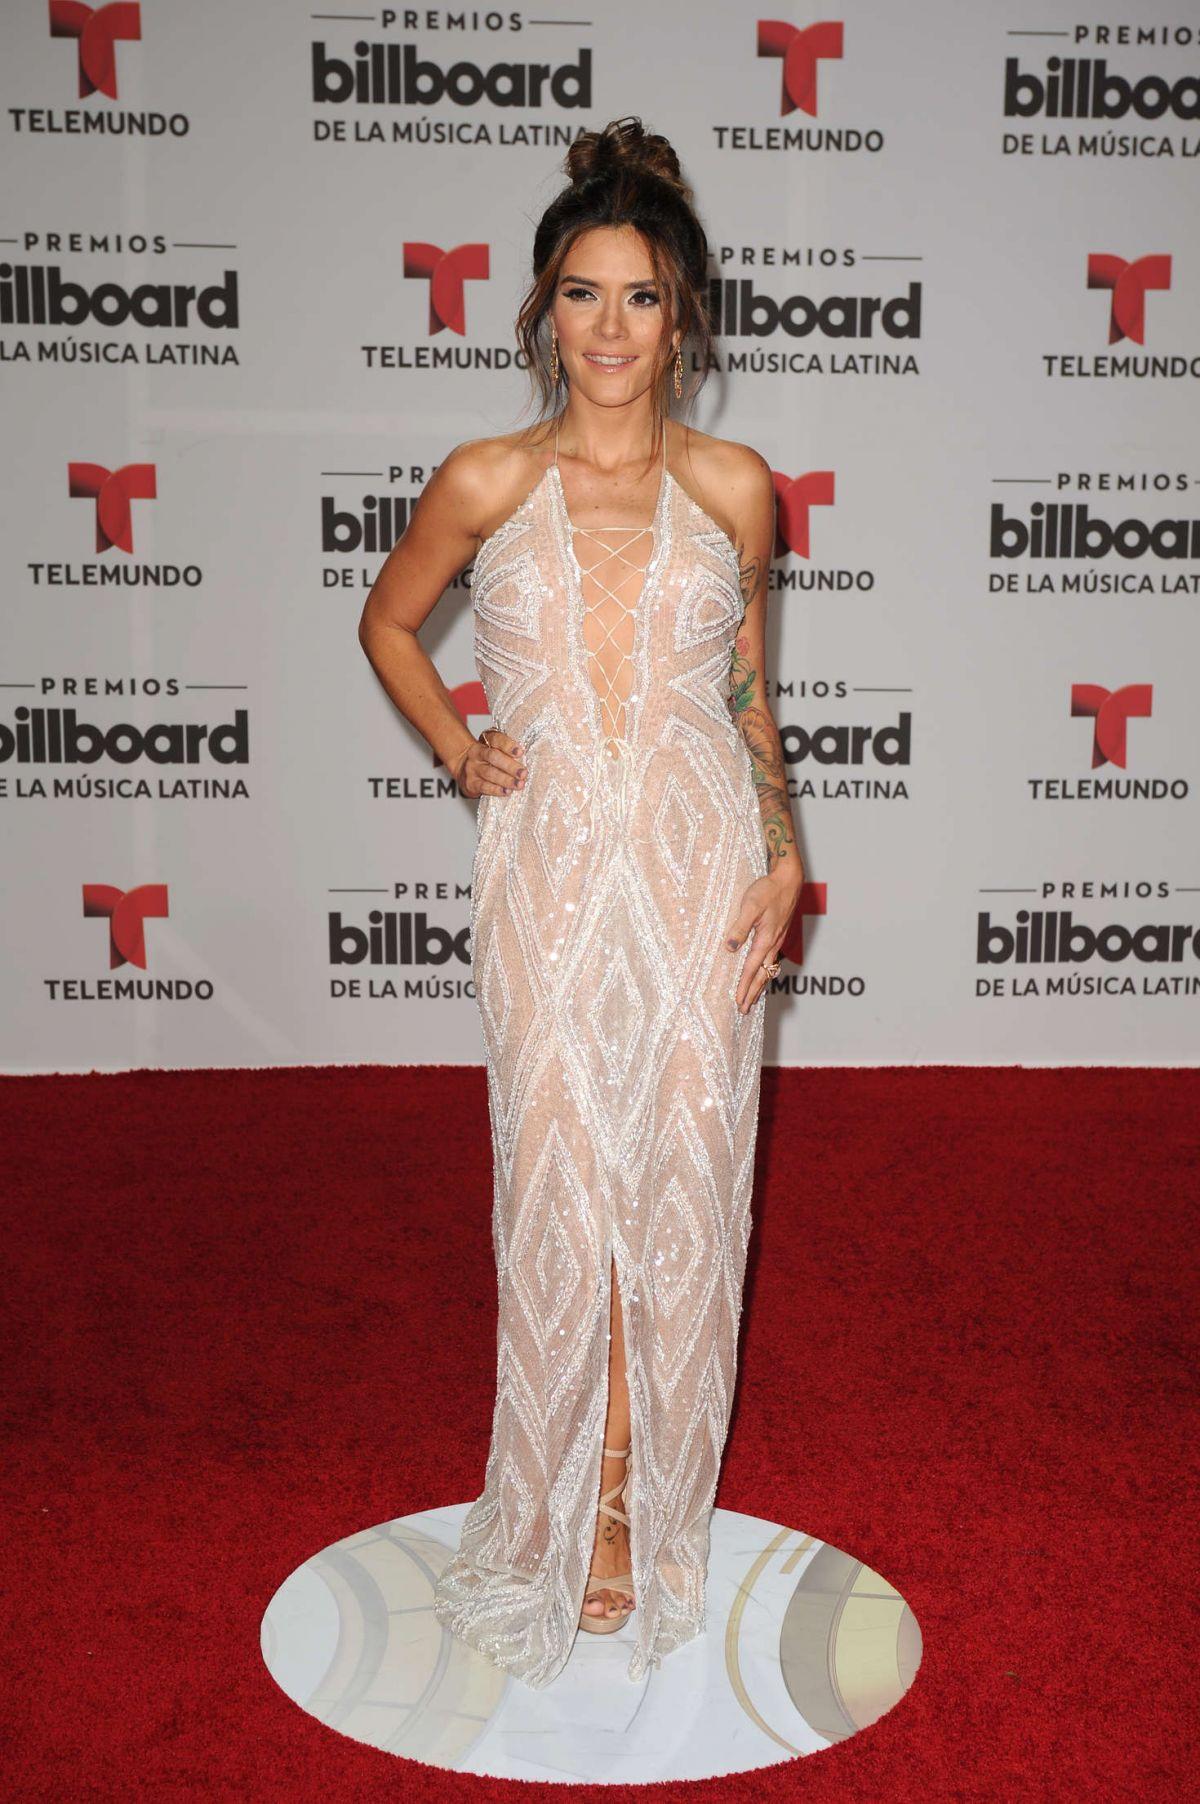 KANY GARCIA at Billboard Latin Music Awards in Miami 04/28/2016